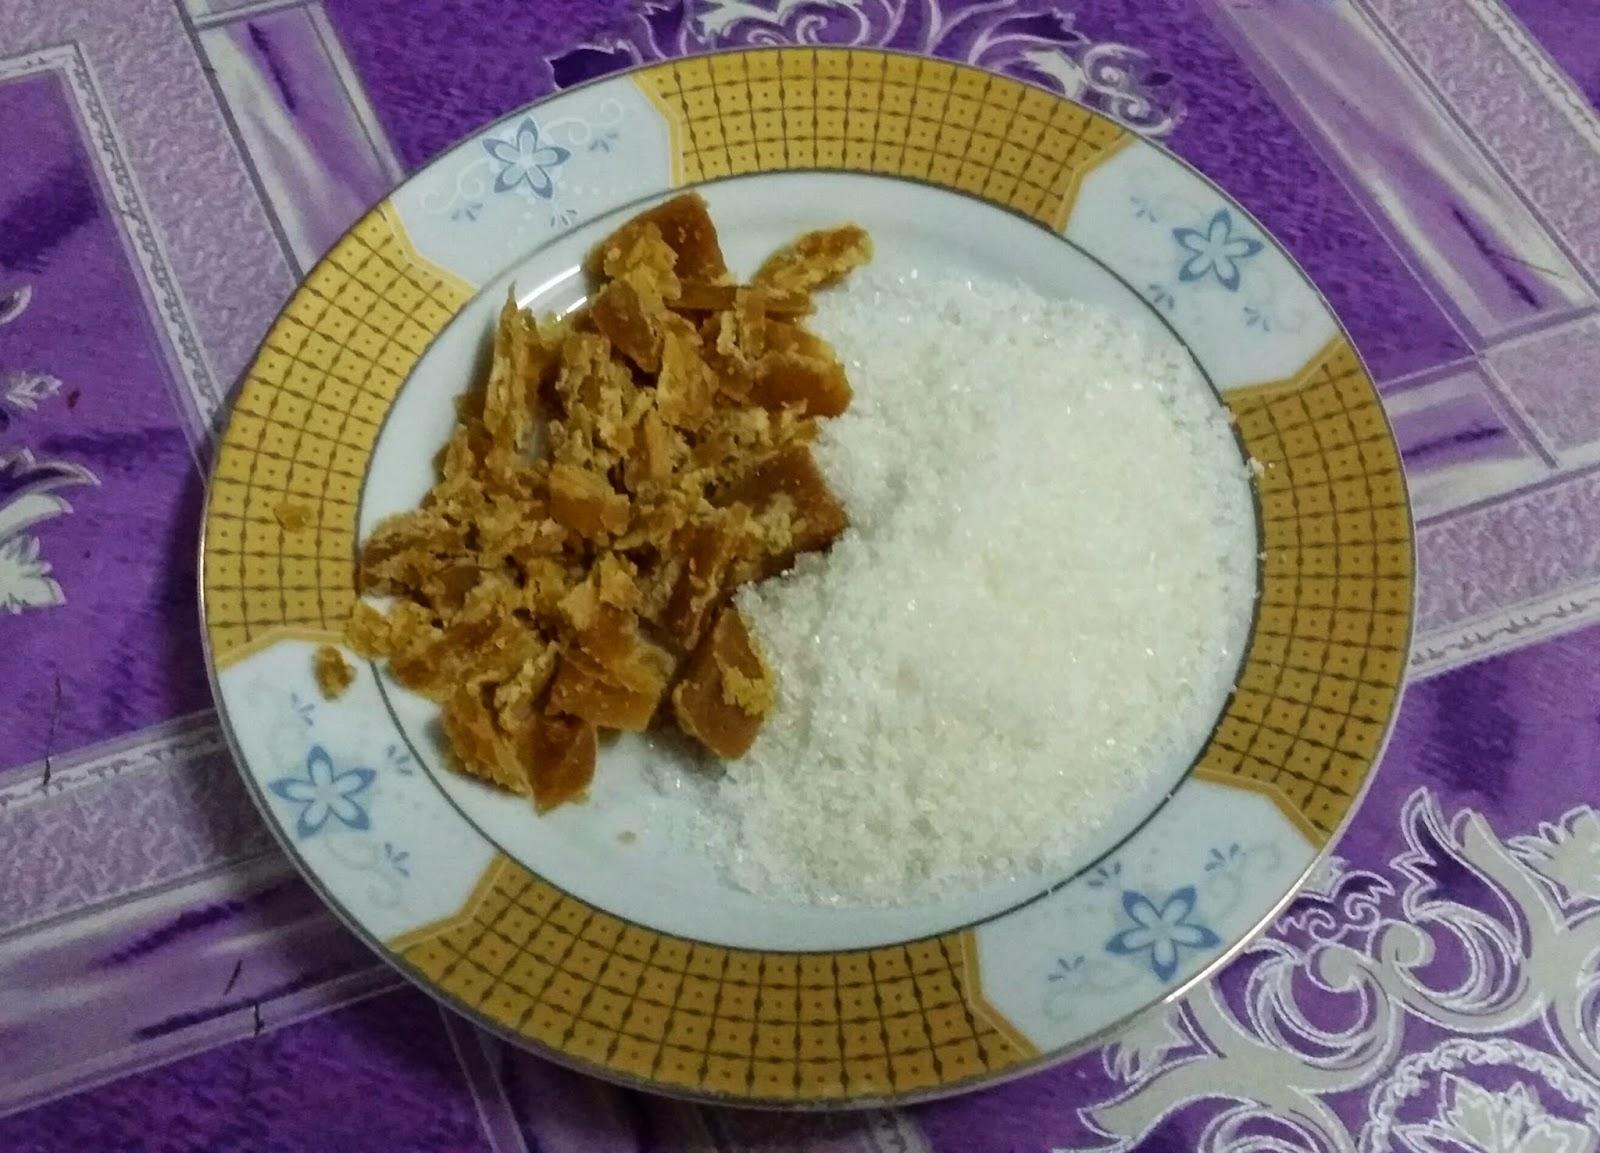 cara buat pulut durian, resepi pulut durian, resepi, cara nak buat, pulut durian, pulut durian yang sedap, cendol pulut,